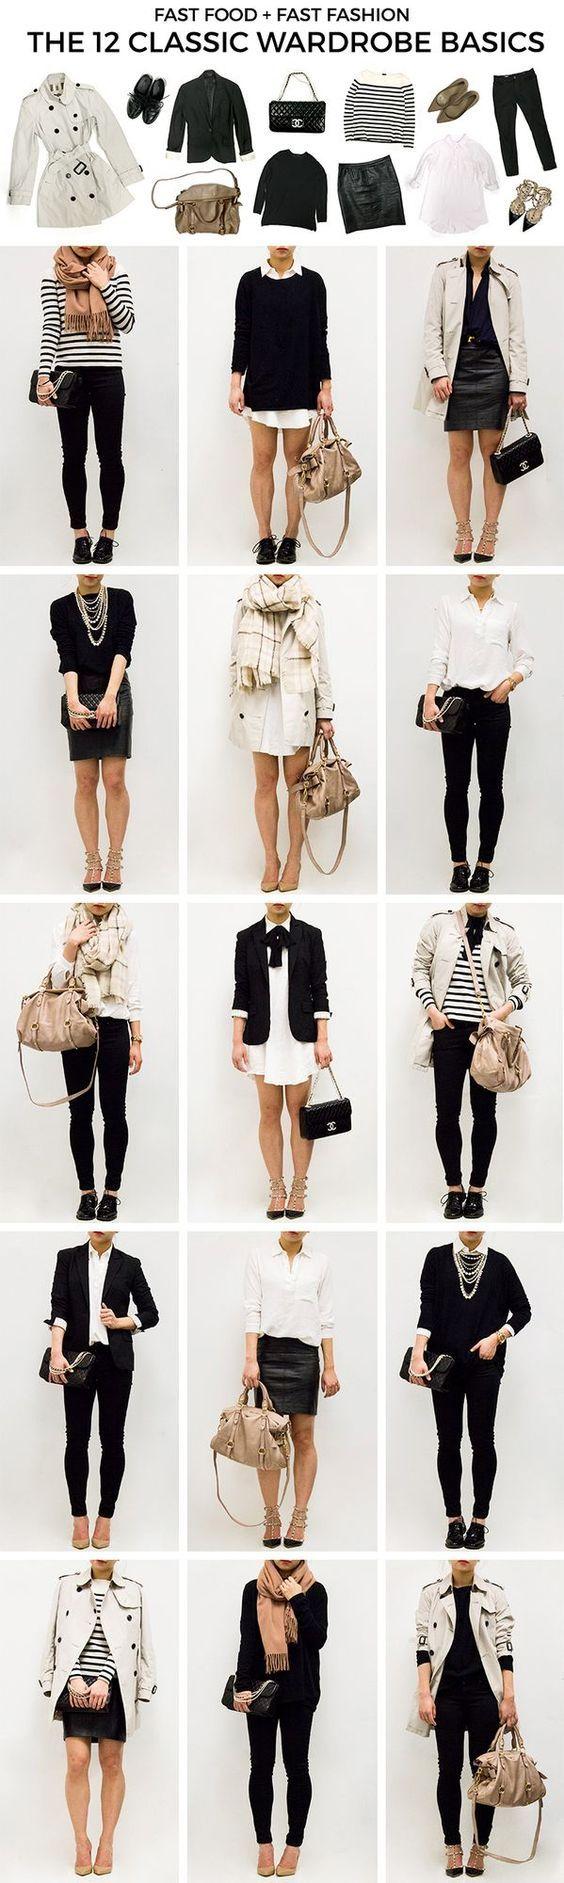 The Ultimate Capsule Wardrobe: Basics | Fast Food & Fast Fashion | Bloglovin':